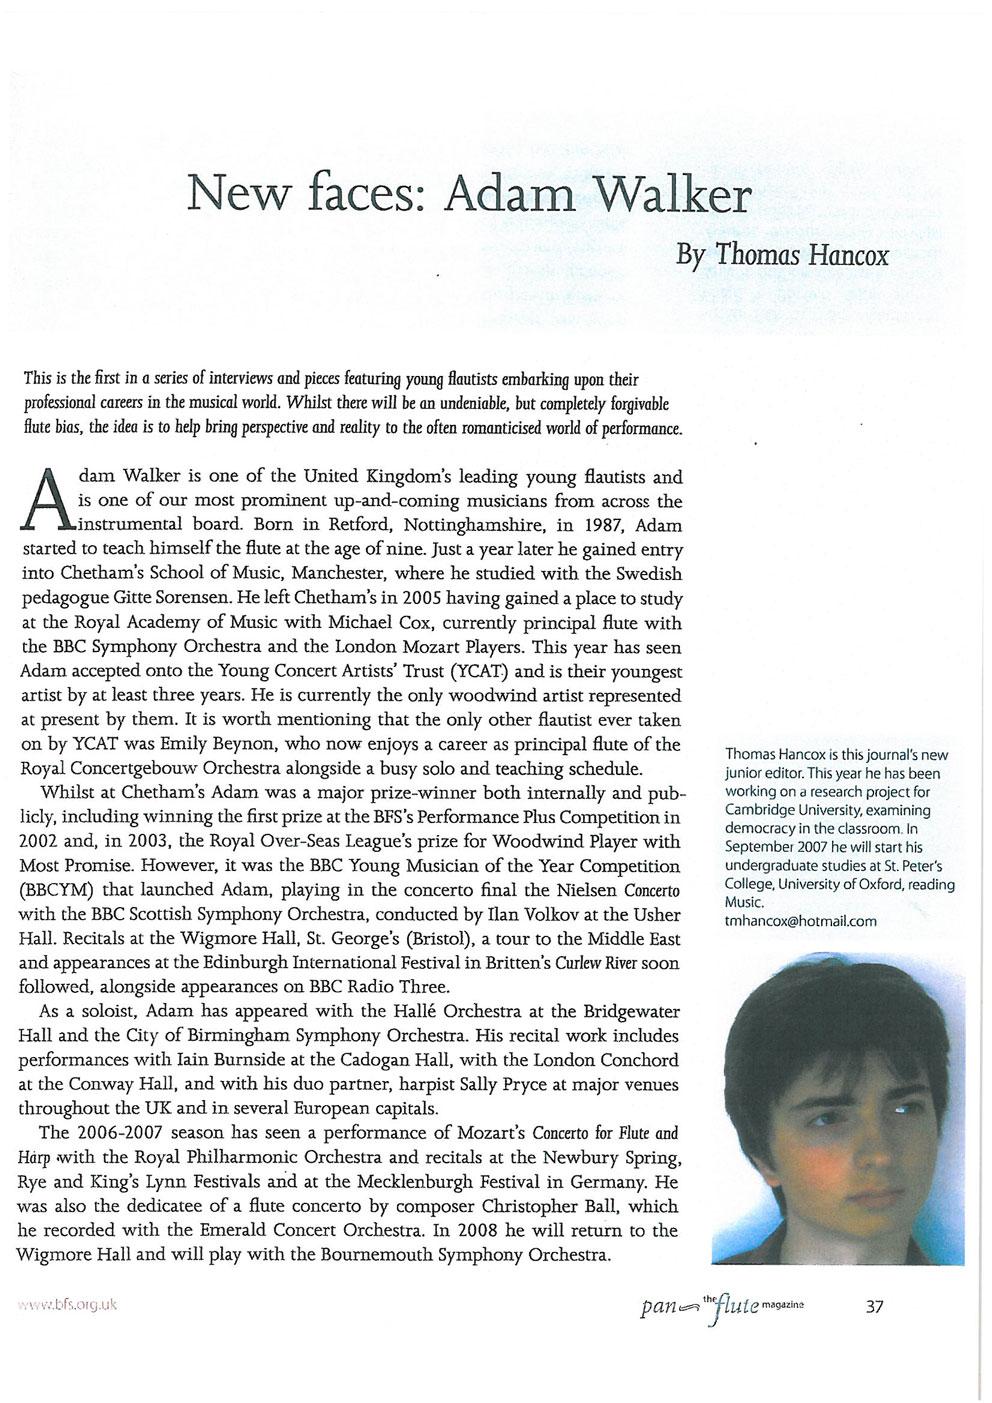 Interview, 2007, Pan, p1